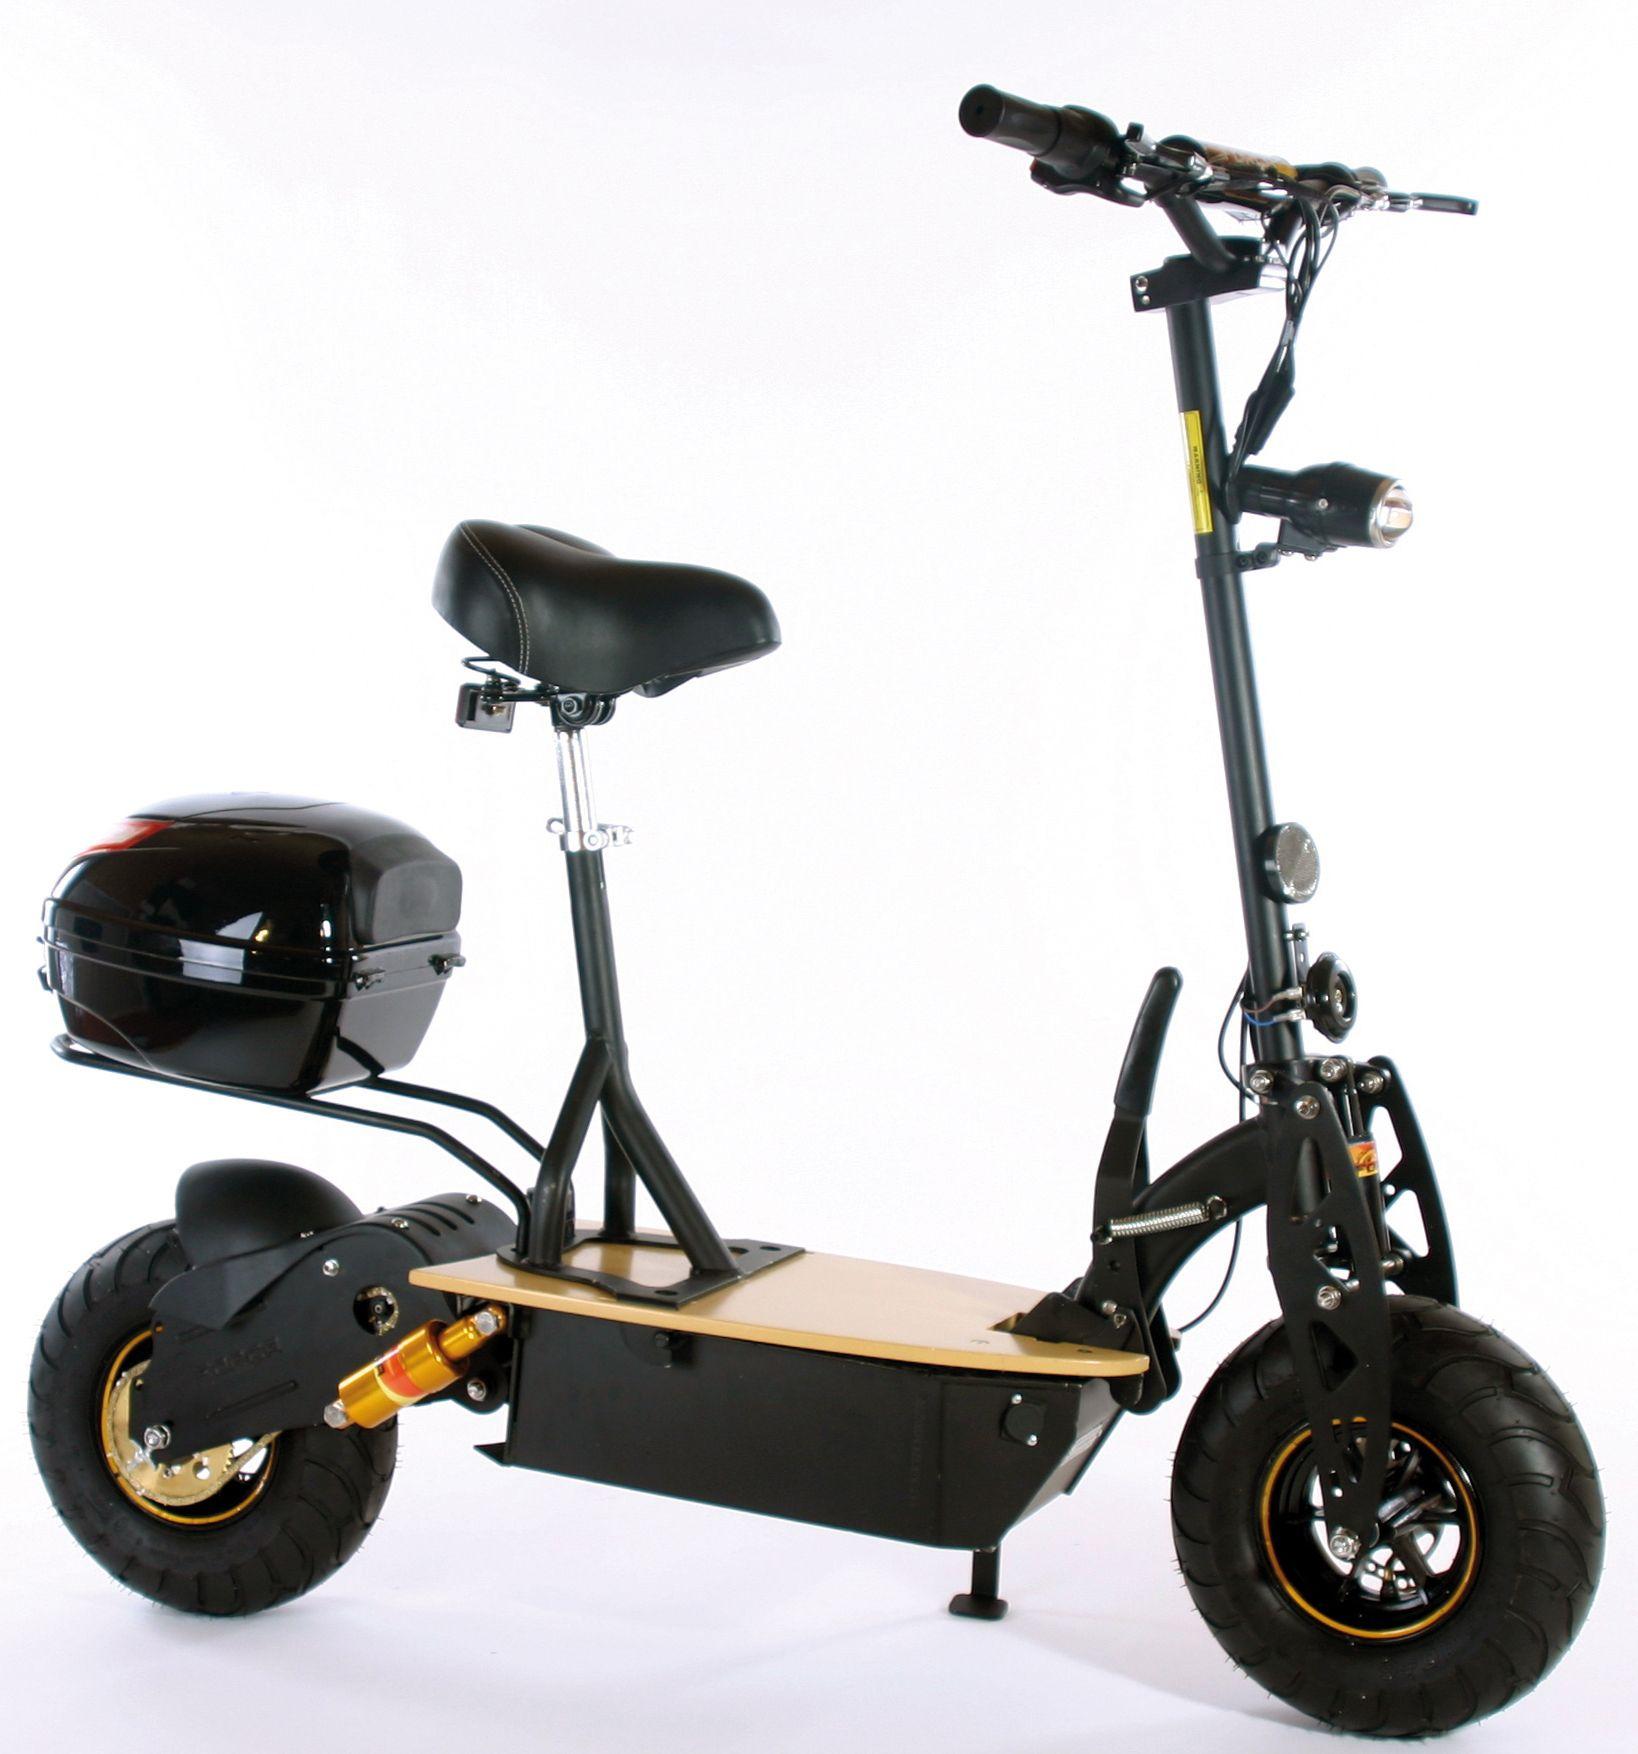 DIDI THURAU EDITION Didi Thurau Edition Elektro-Roller Eco-City-Liner, 45 km/h, »Speed Safety«